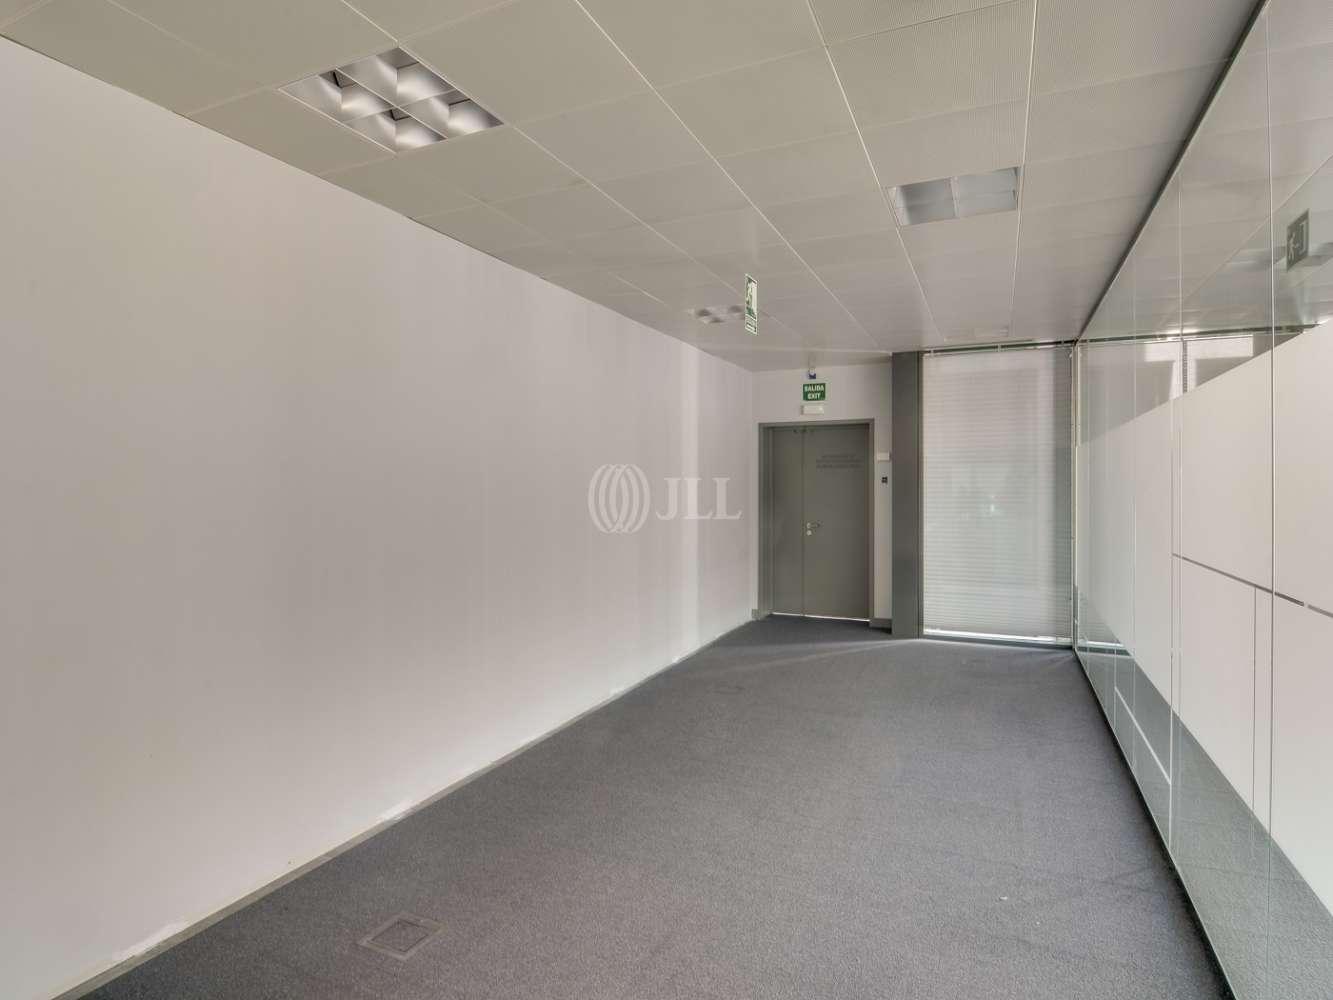 Oficina Alcobendas, 28108 - VEGANORTE Edif. 2 - 15194